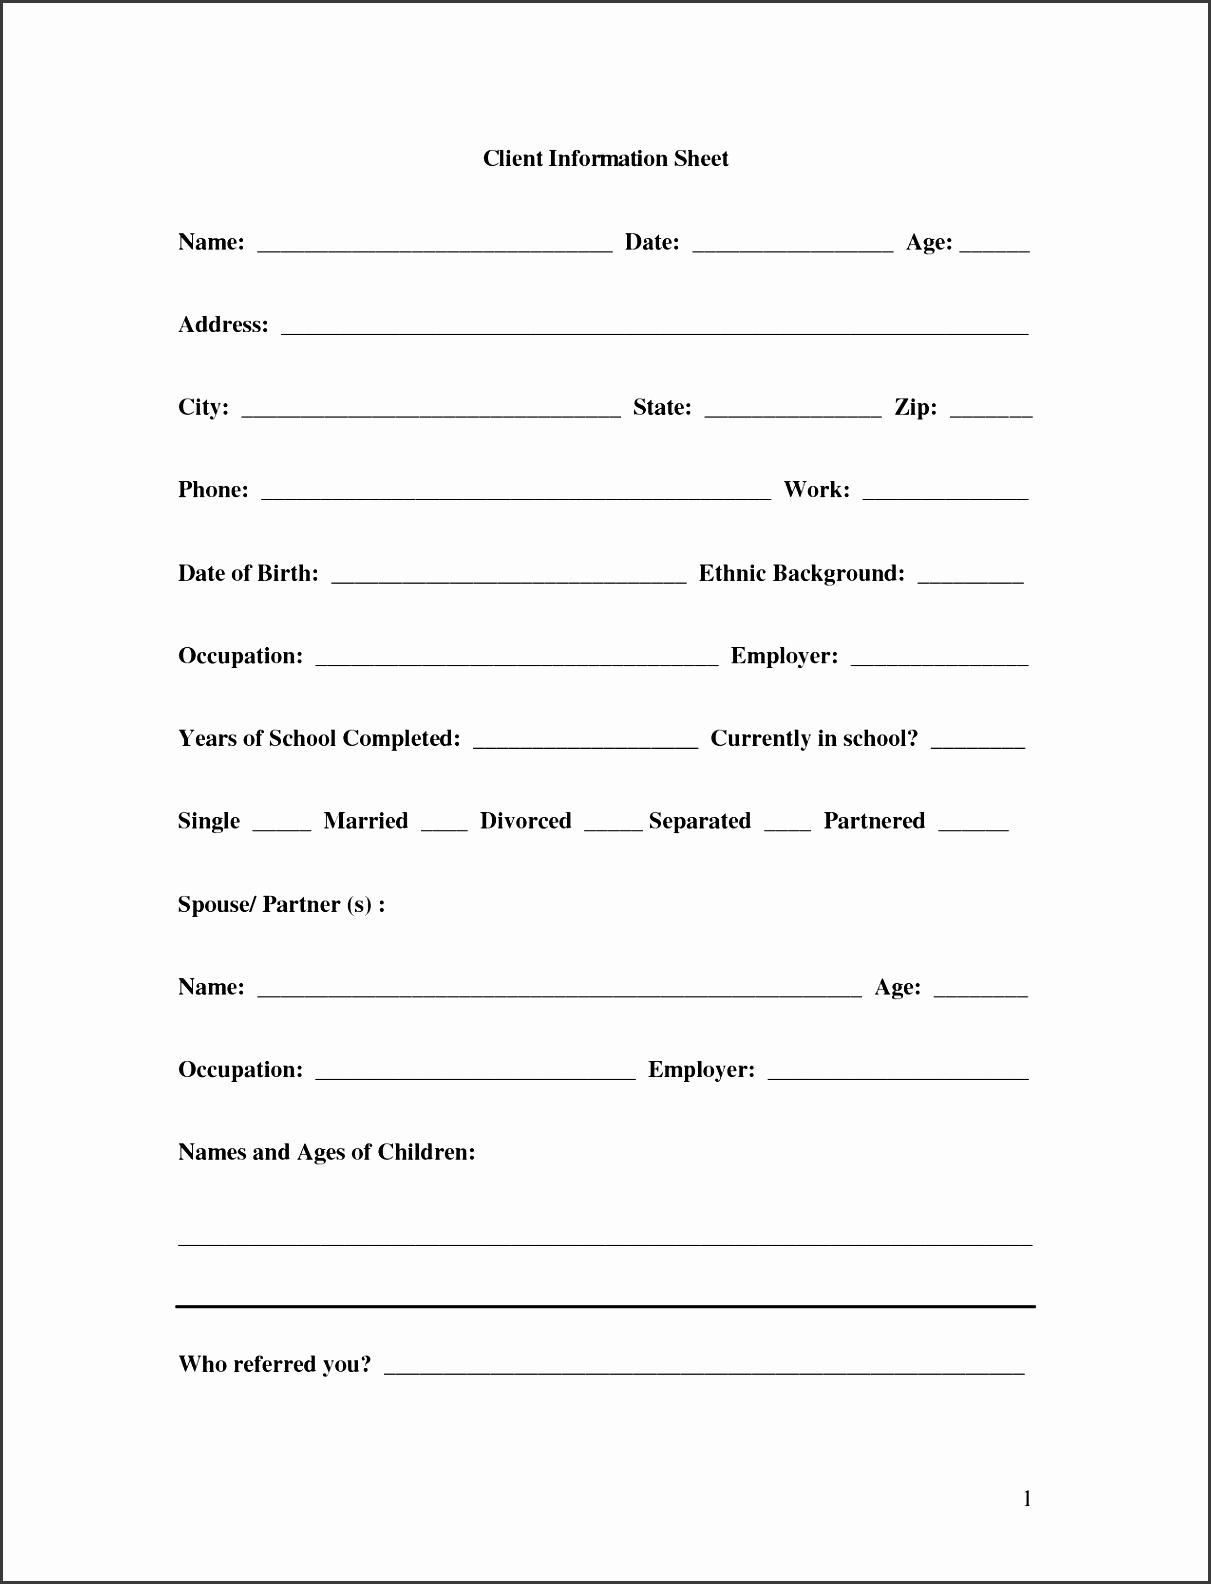 Customer Information Sheet Template Elegant 11 Client Database Sheet Template Sampletemplatess